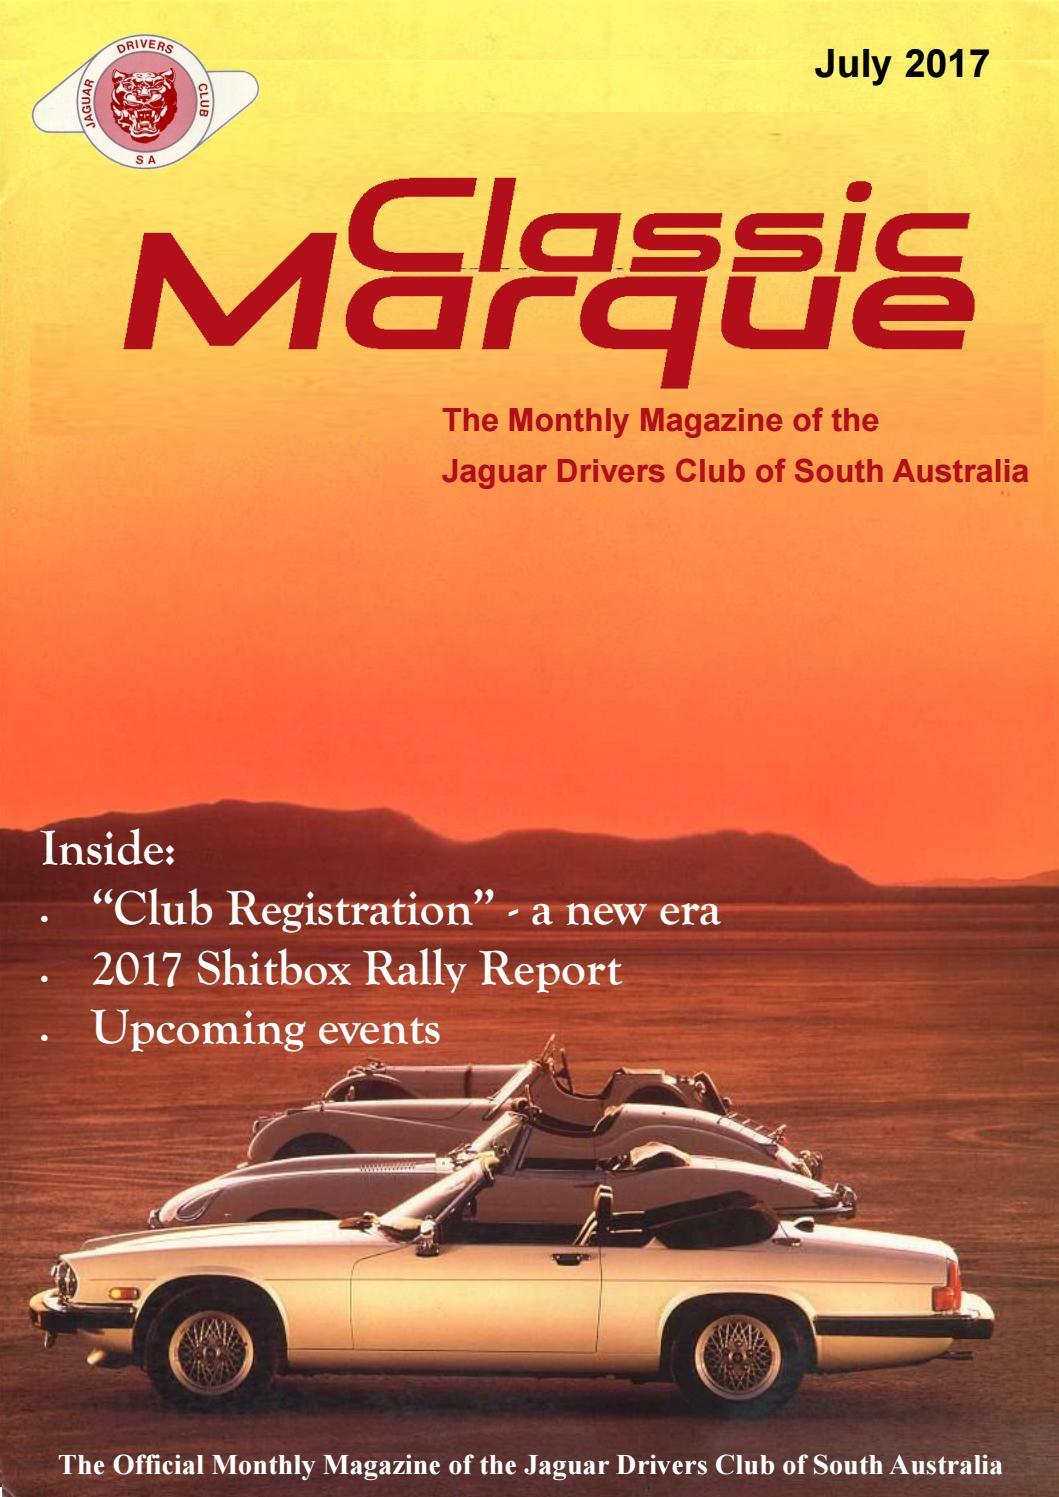 Classic Marque July 2017 by Jaguar Drivers Club of SA - issuu